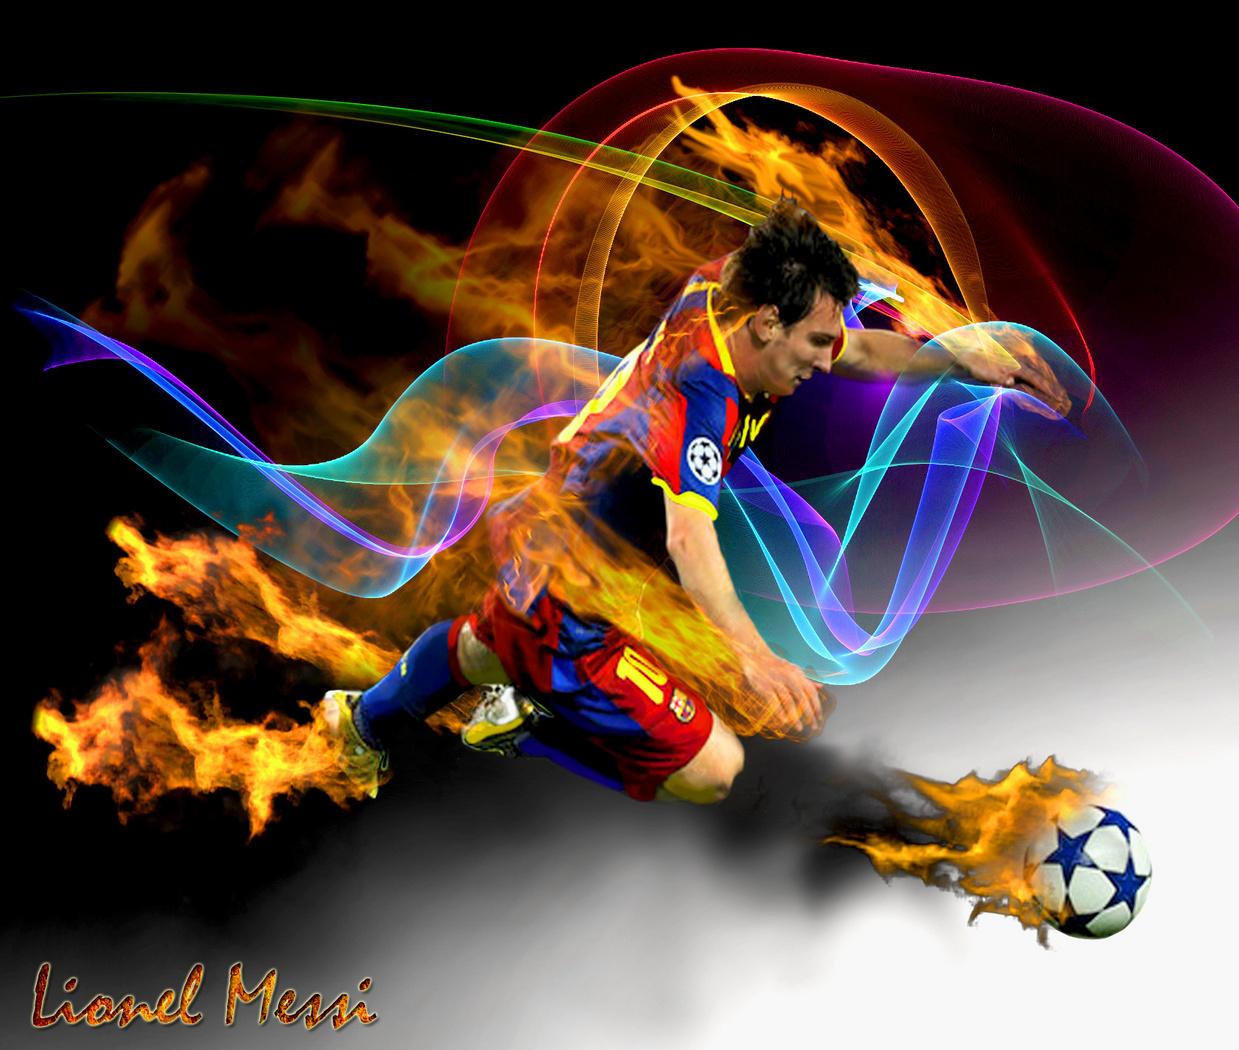 Lionel Messi hd Wallpaper 1239x1050